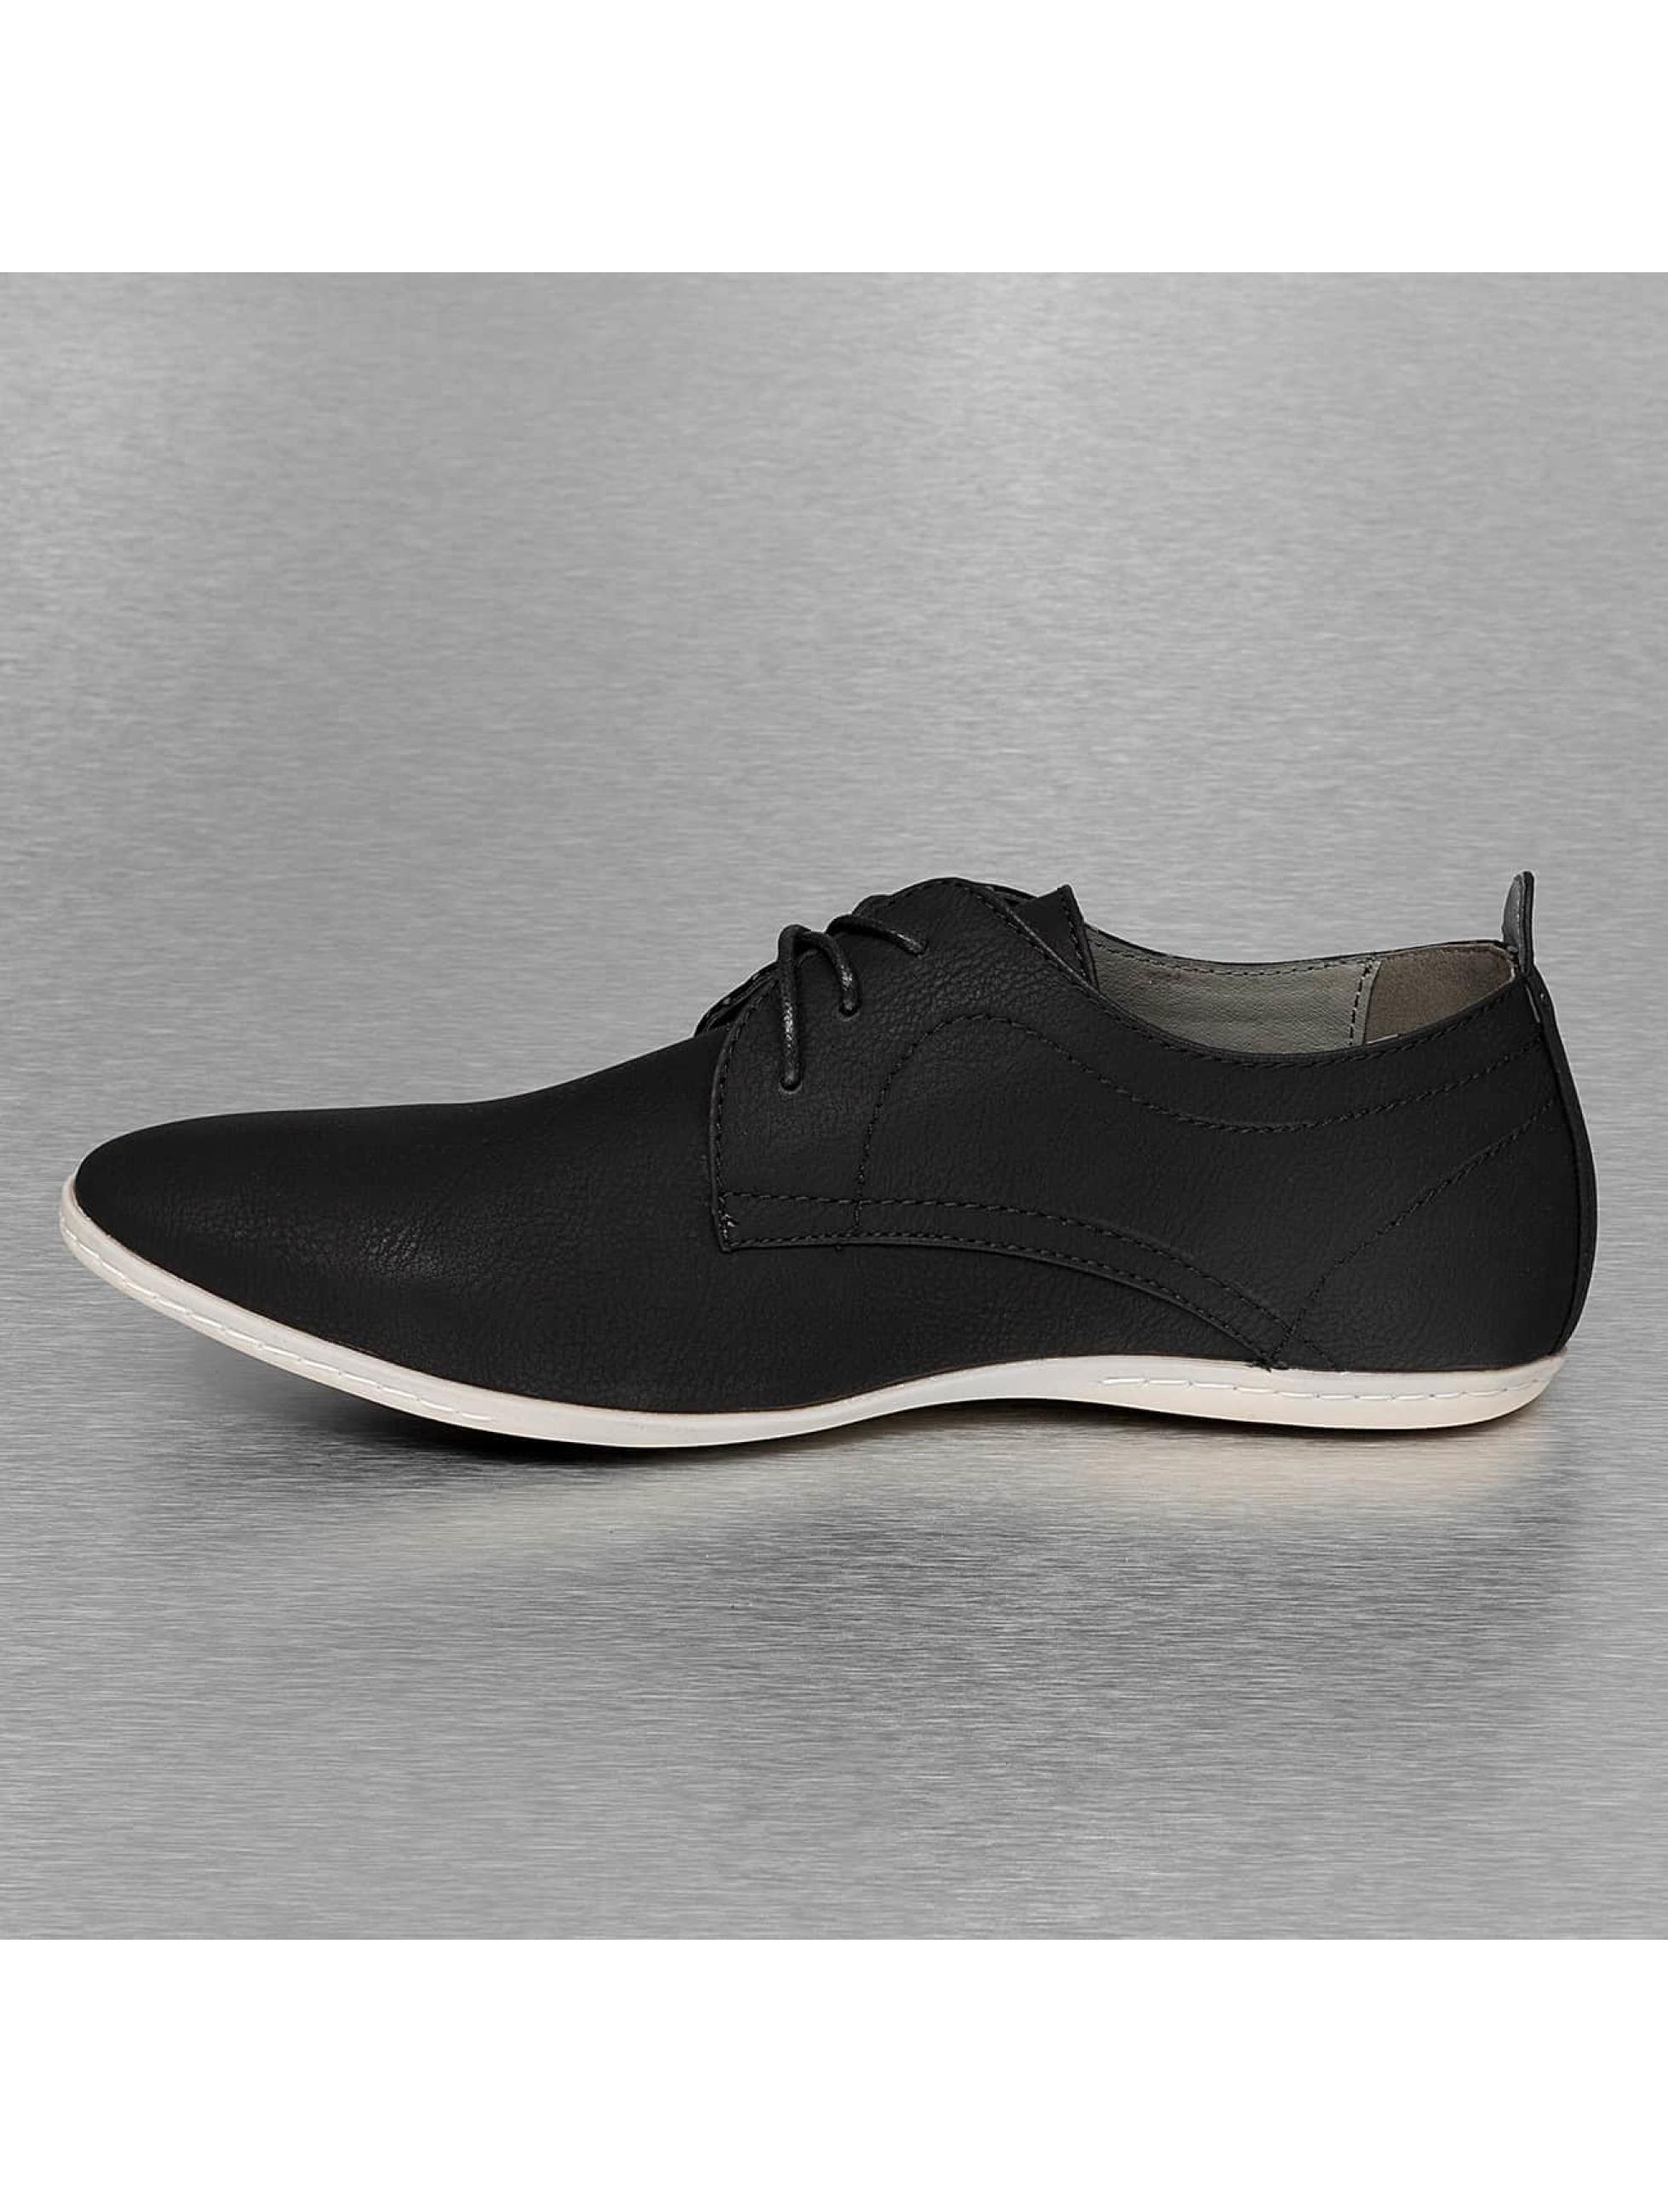 New York Style sneaker Style zwart